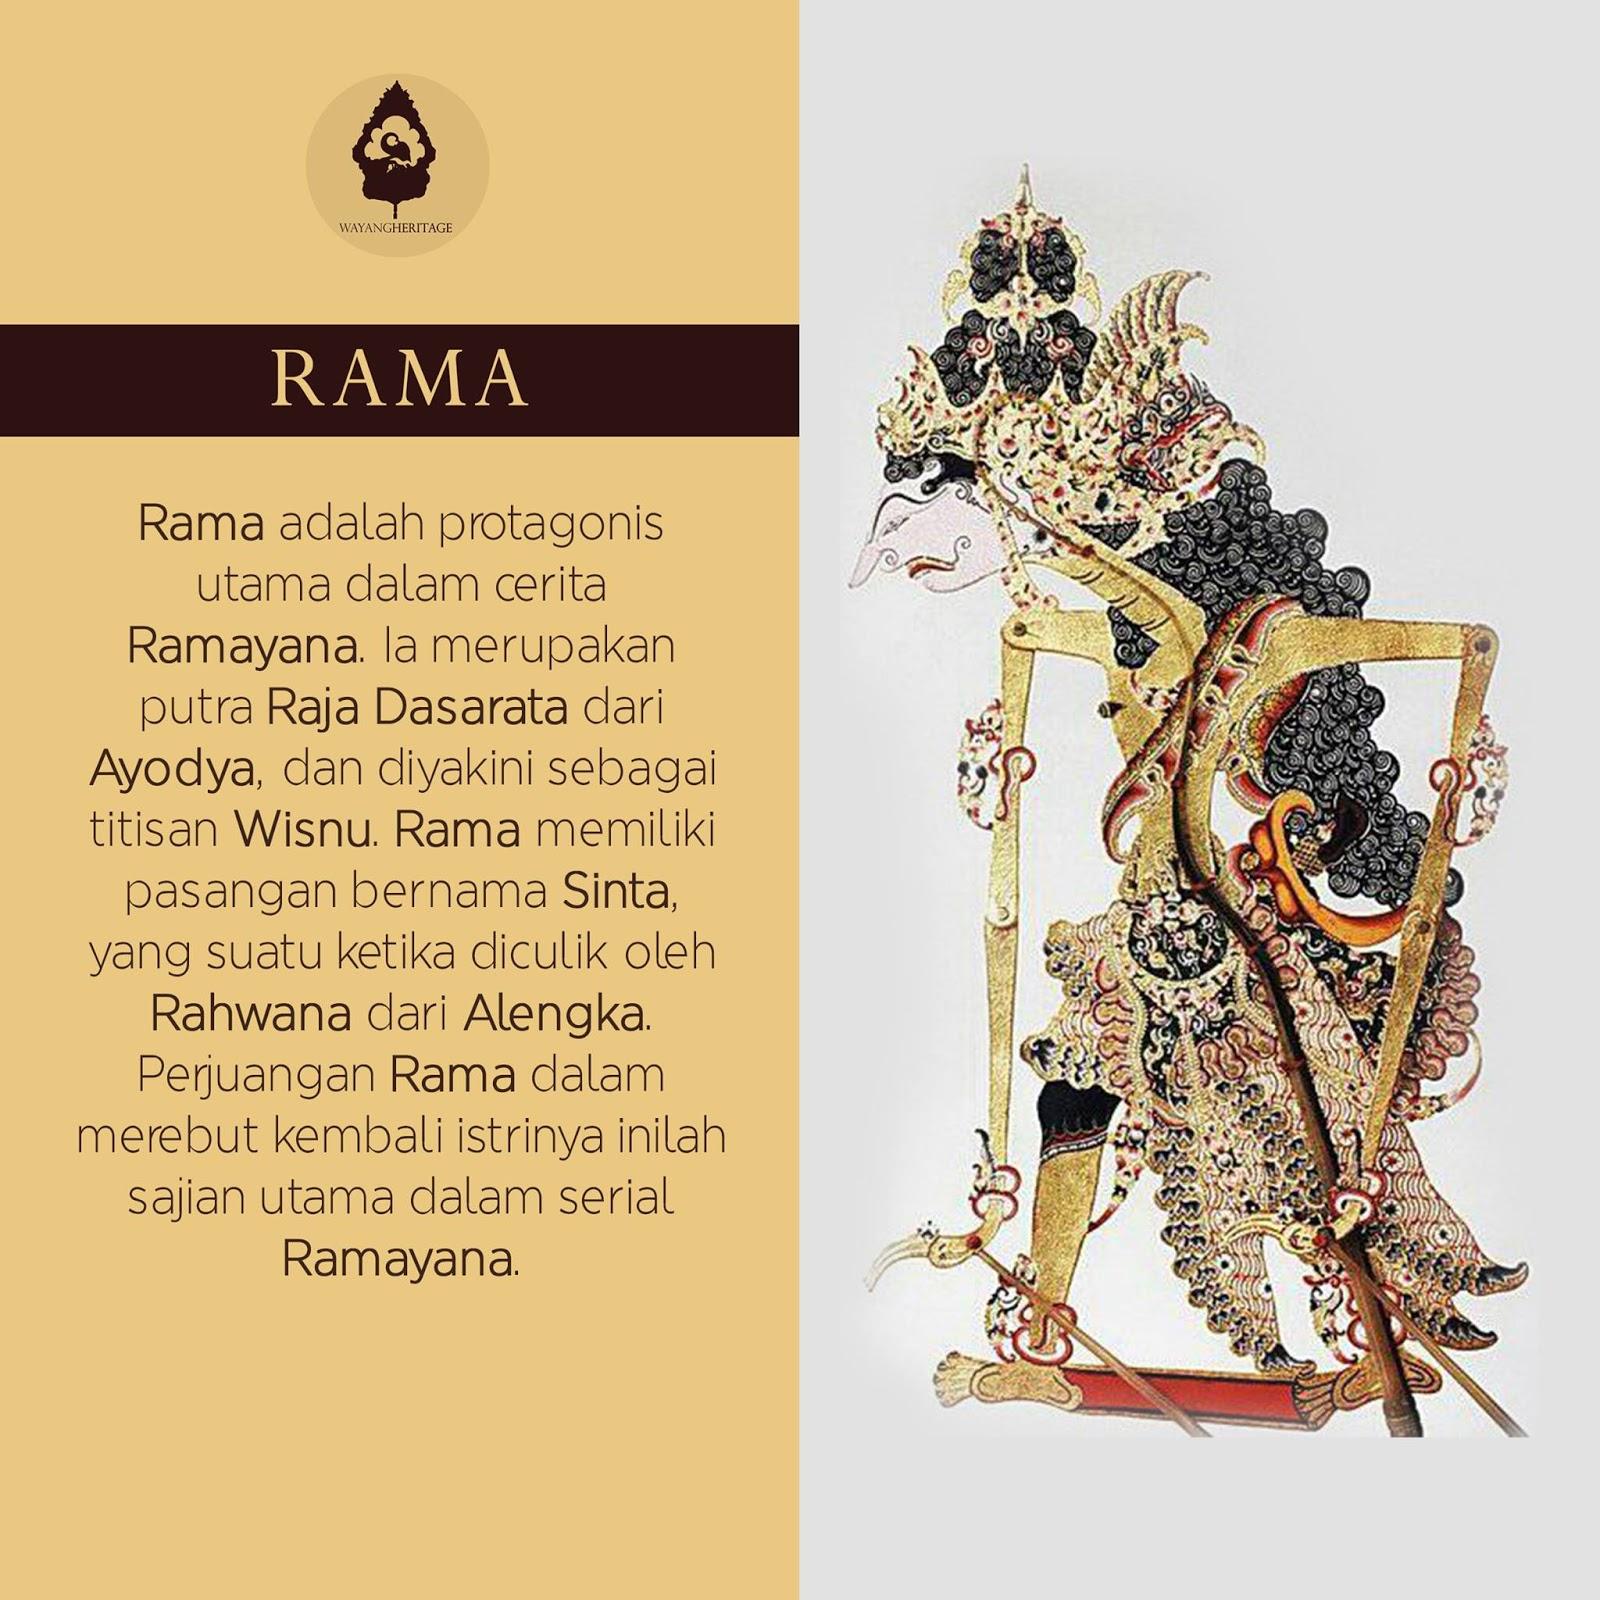 Kemudian dipahat dengan menggunakan besi yang ujungnya lancip atau runjing. Gambar Wayang Ramayana Dan Kisah Rama Shinta